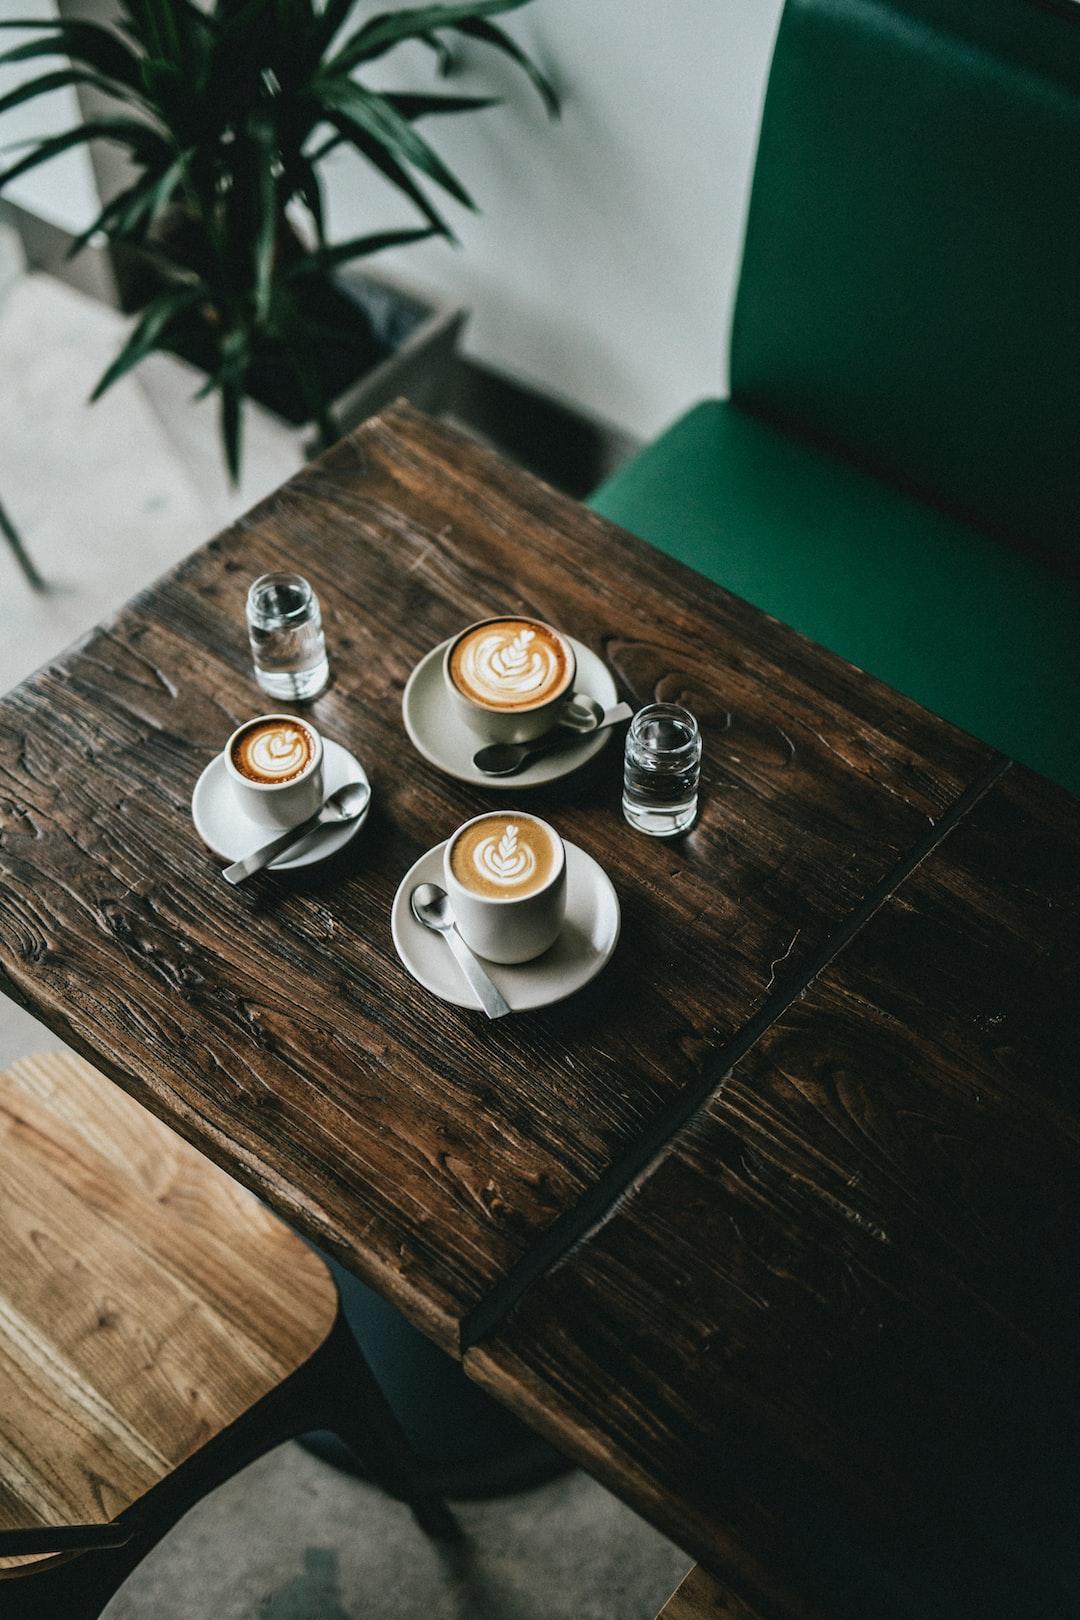 three latte arts in cup photo u2013 Free u003cbu003eCoffeeu003c/bu003e Image on Unsplash